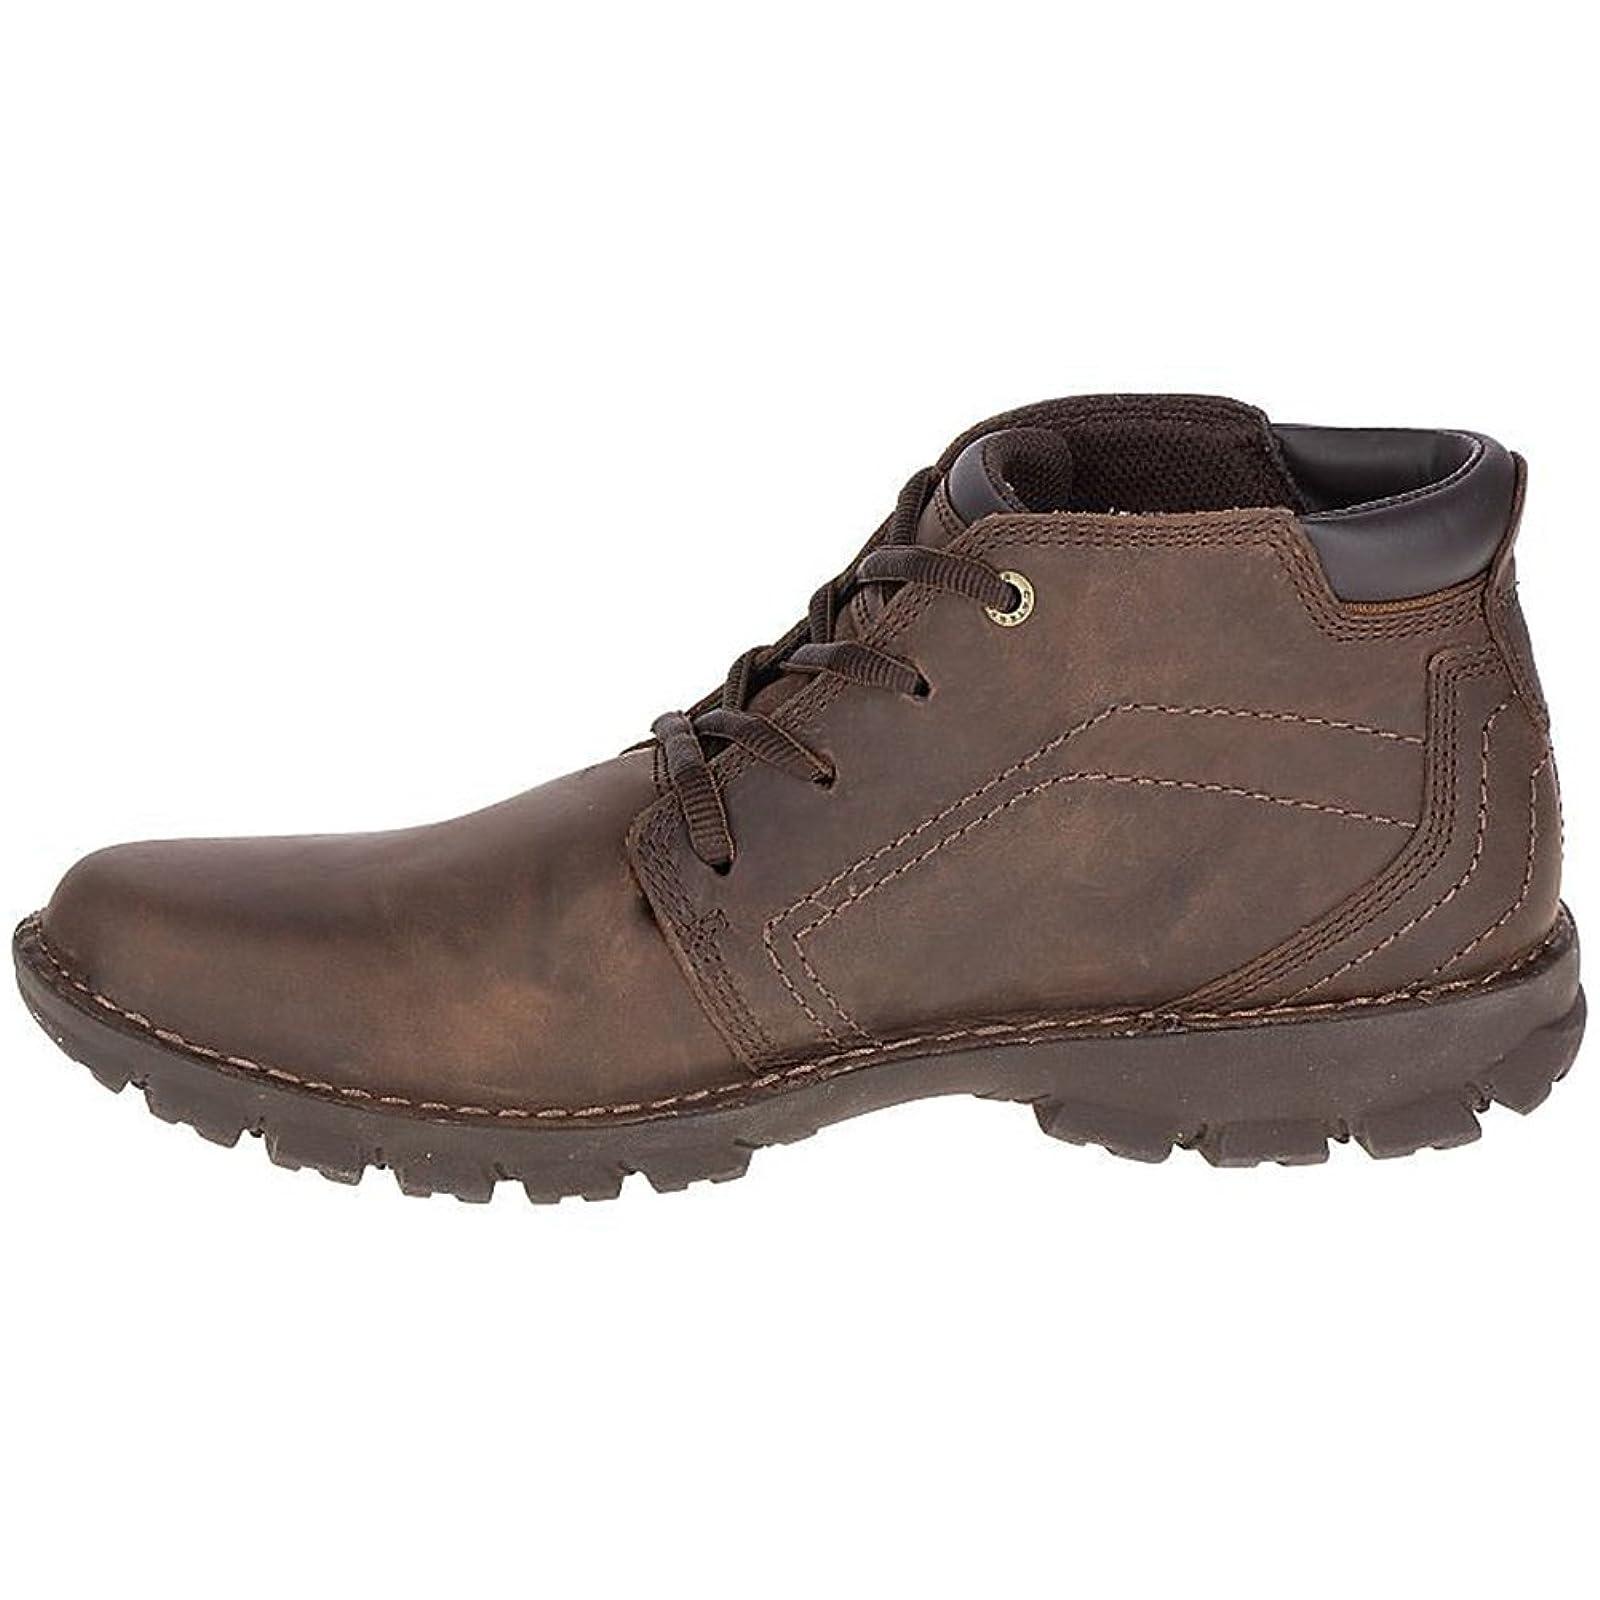 Caterpillar Men's Transform 2.0 Ankle Boot 10 M US - 1